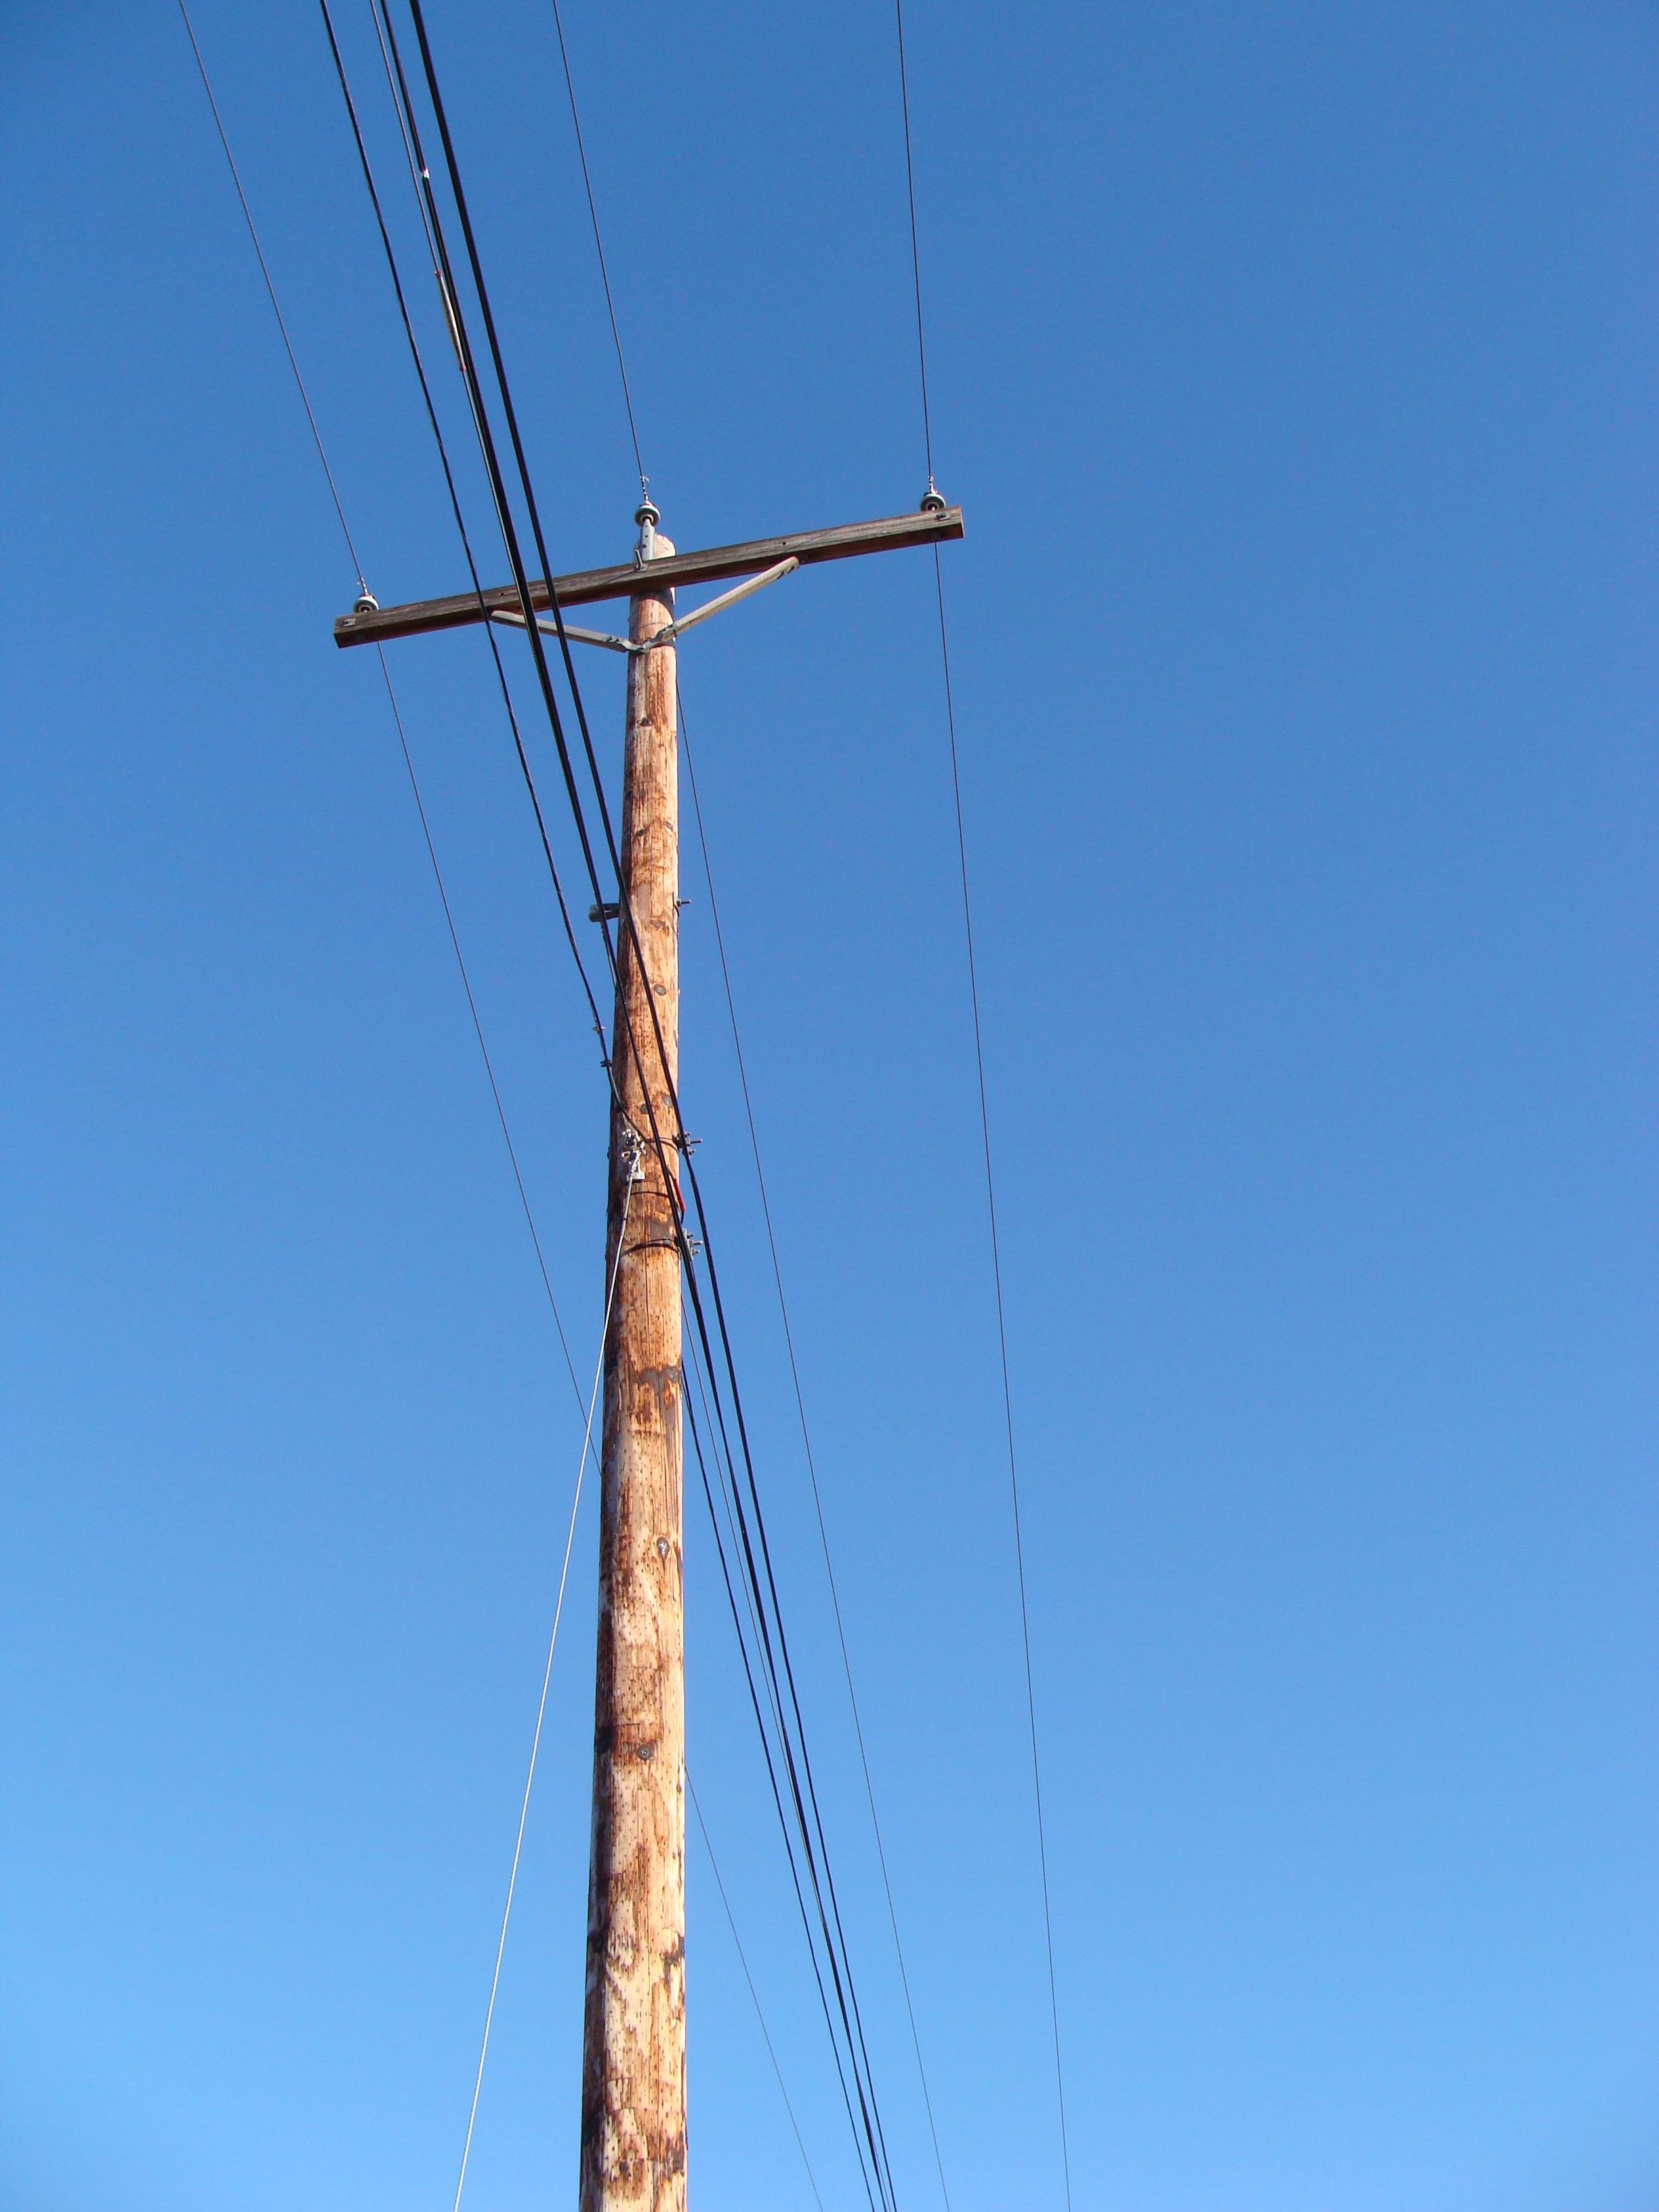 File:Power line.jpg - Wikimedia Commons